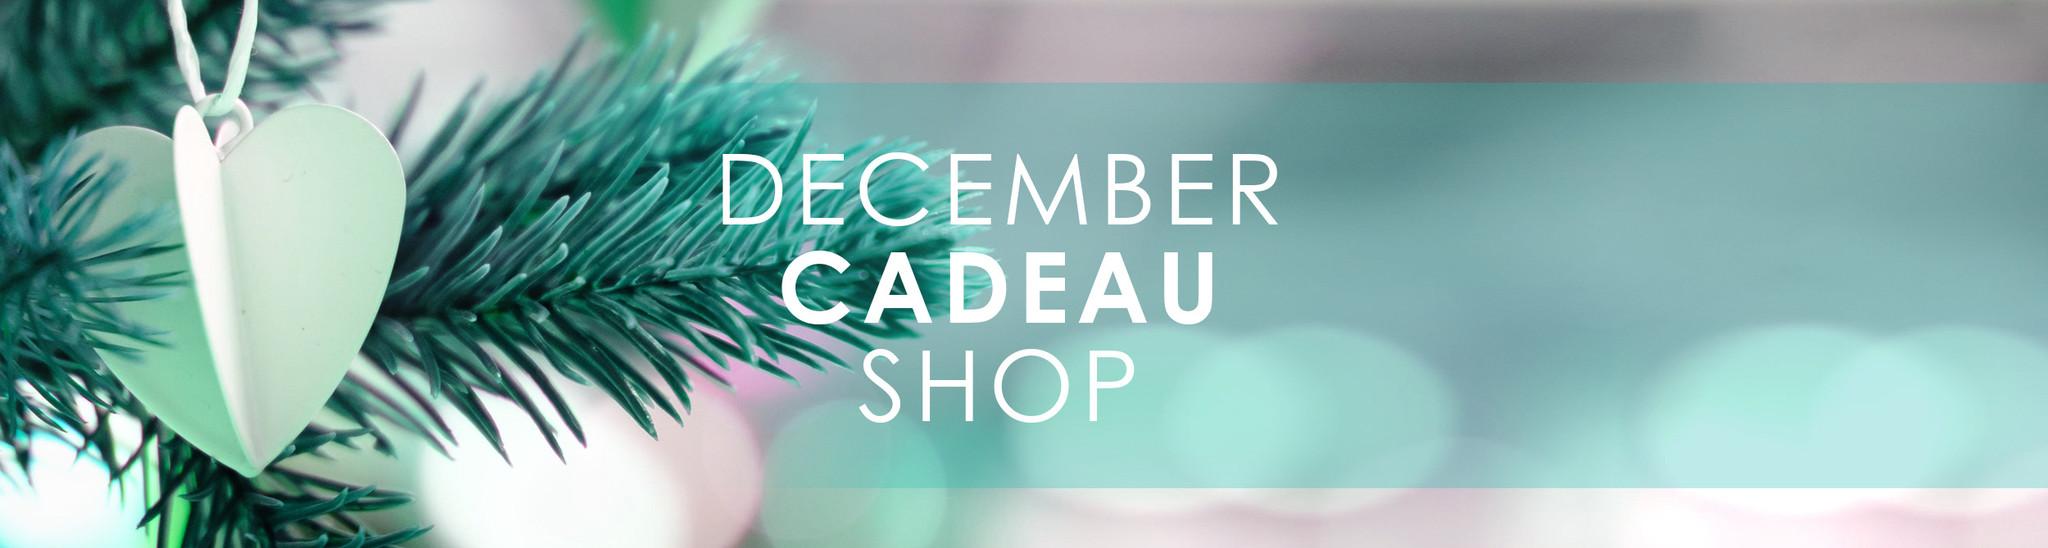 December Cadeau Shop